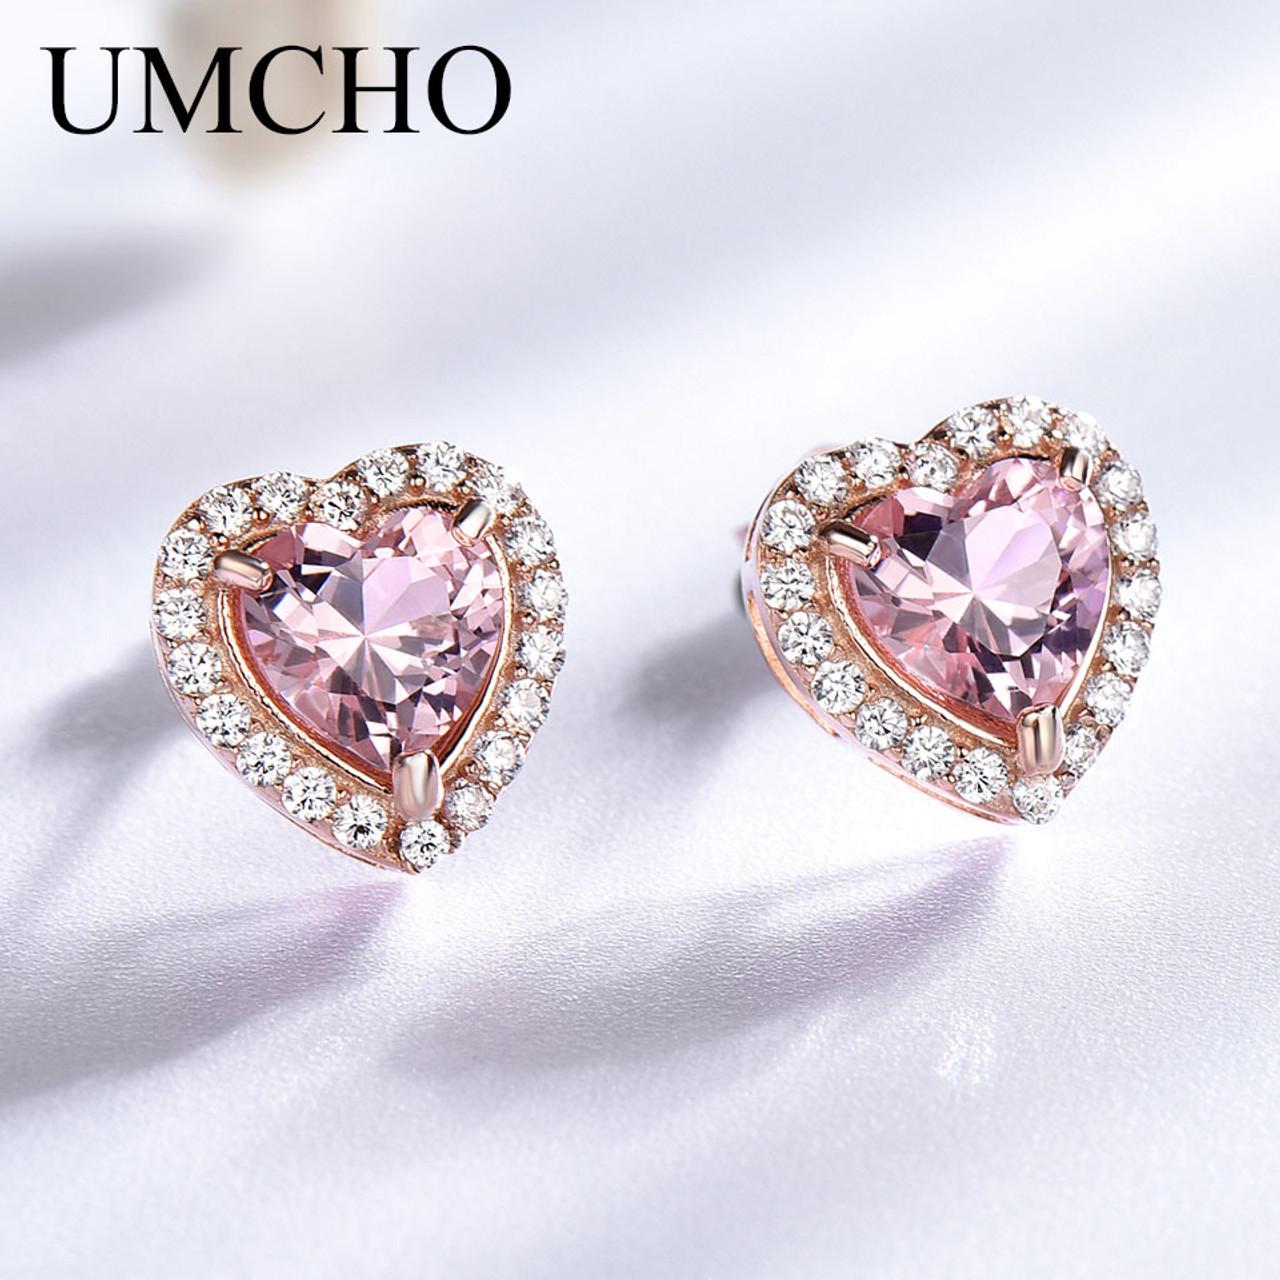 988ae118d49aa UMCHO Sweet Heart 925 Sterling Silver Earrings Created Nano Morganite  Earrings Anniversary Gifts For Women Fine Jewelry